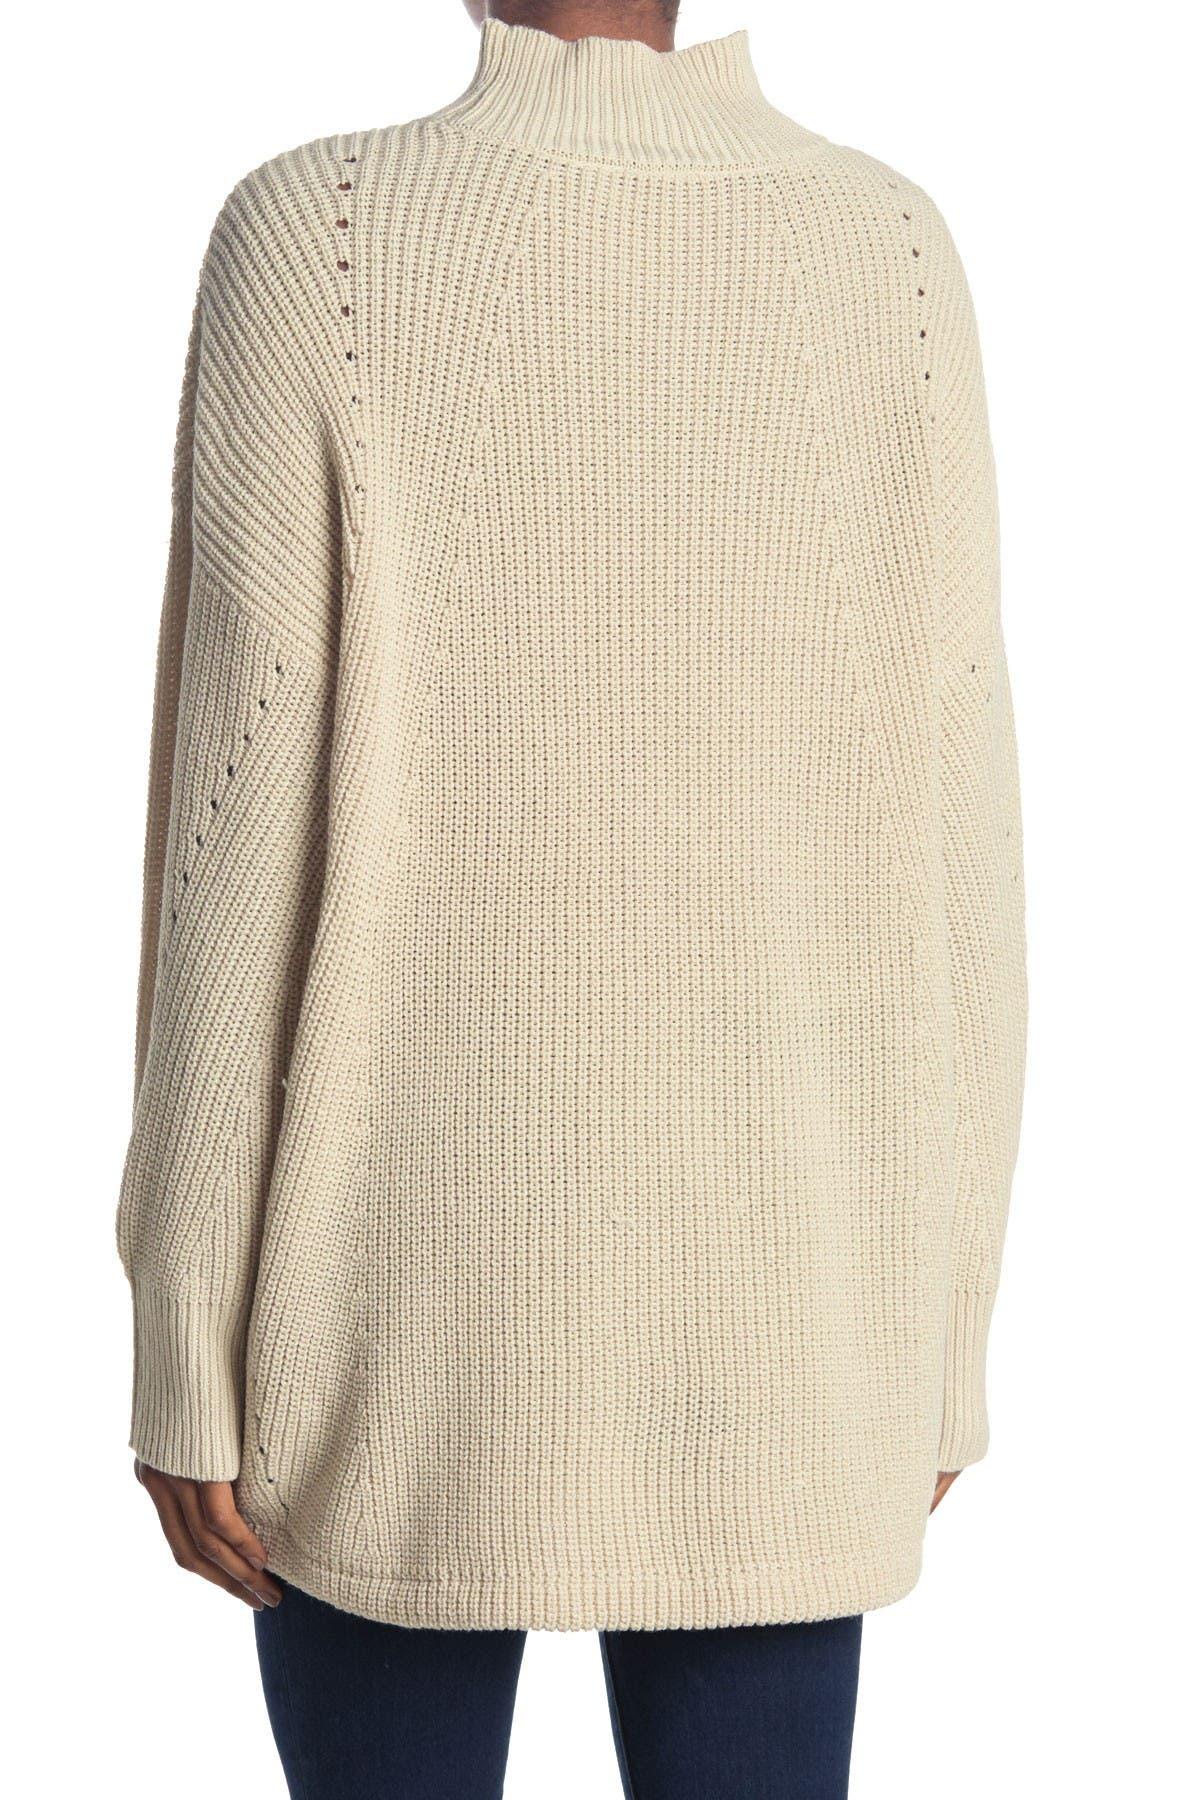 Image of Modern Designer Mock Neck Kangaroo Pocket Ribbed Tunic Sweater